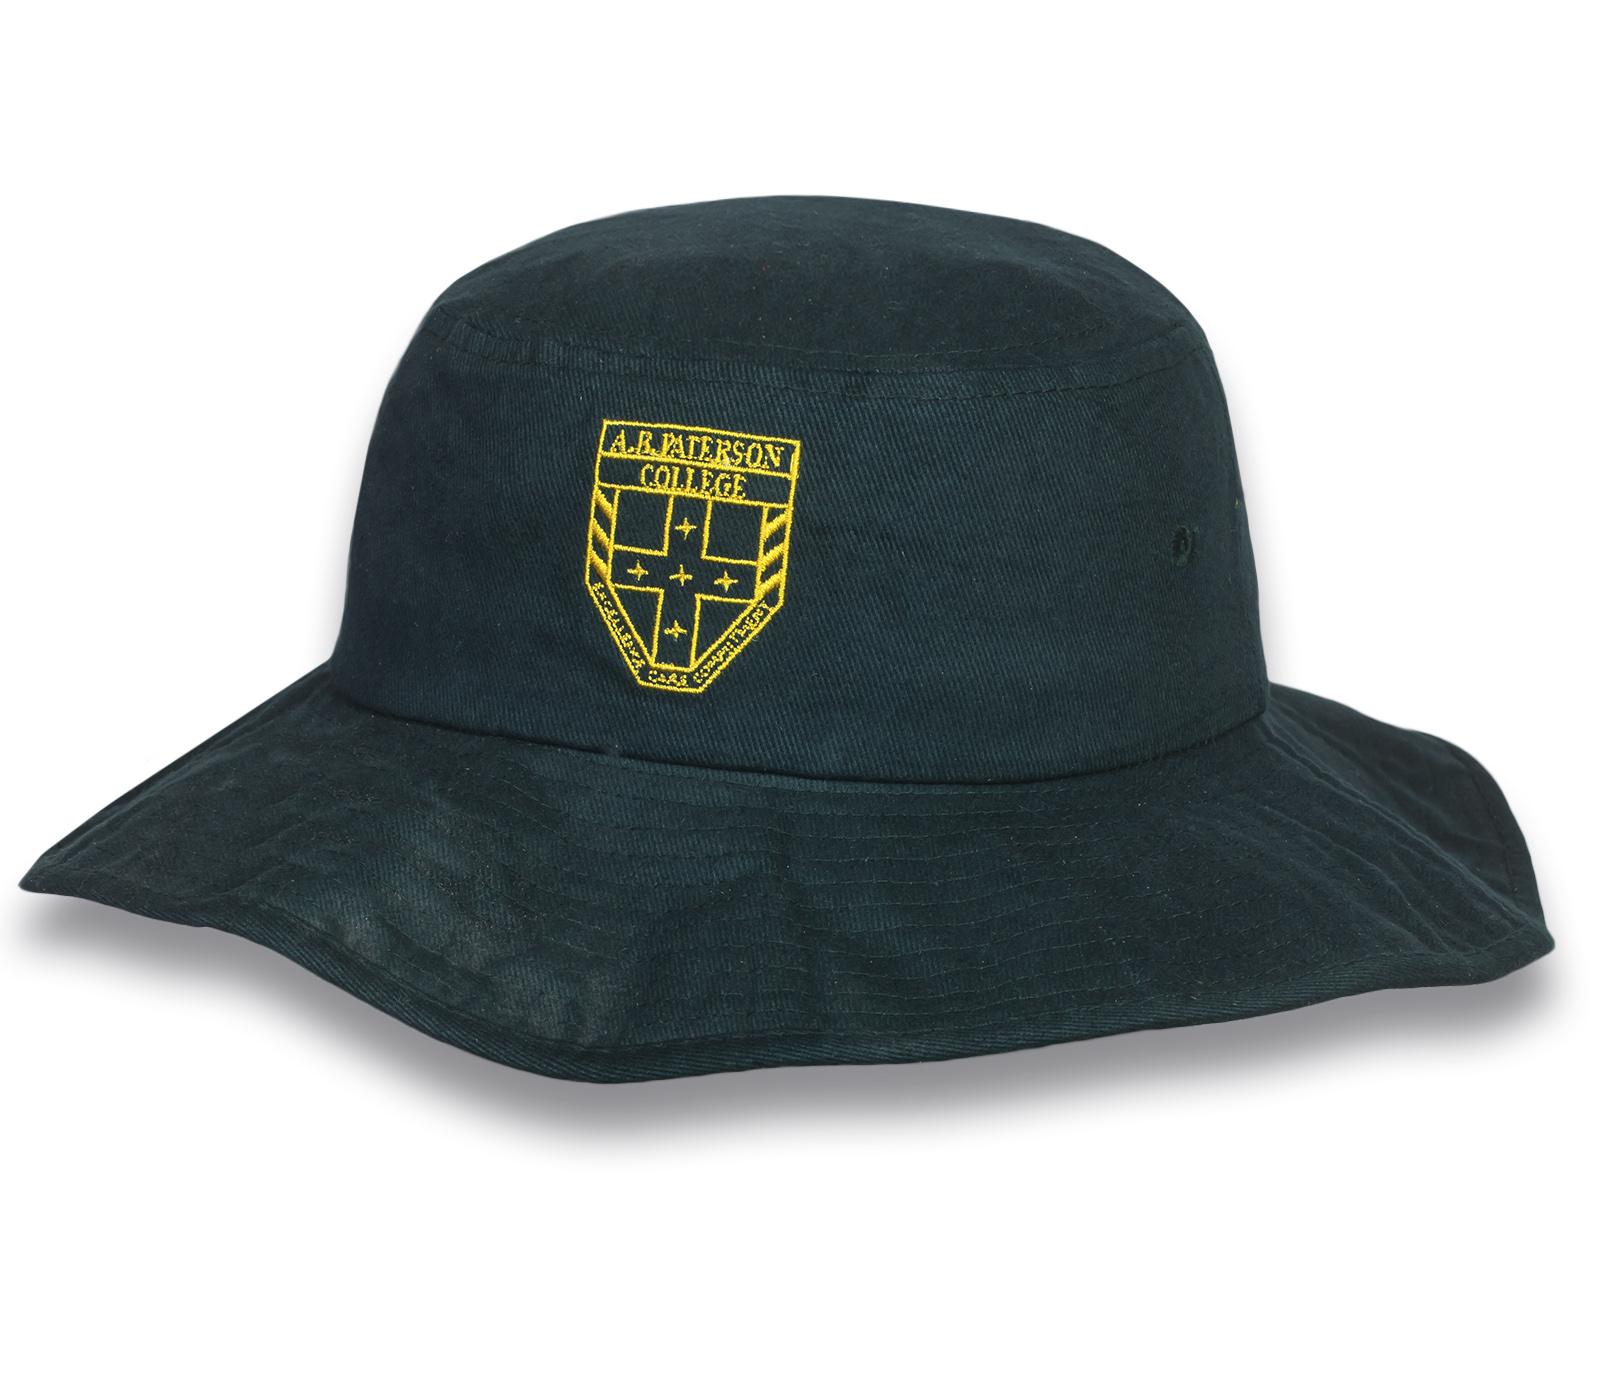 Темно-зеленая сочная шляпа-панама - купить онлайн